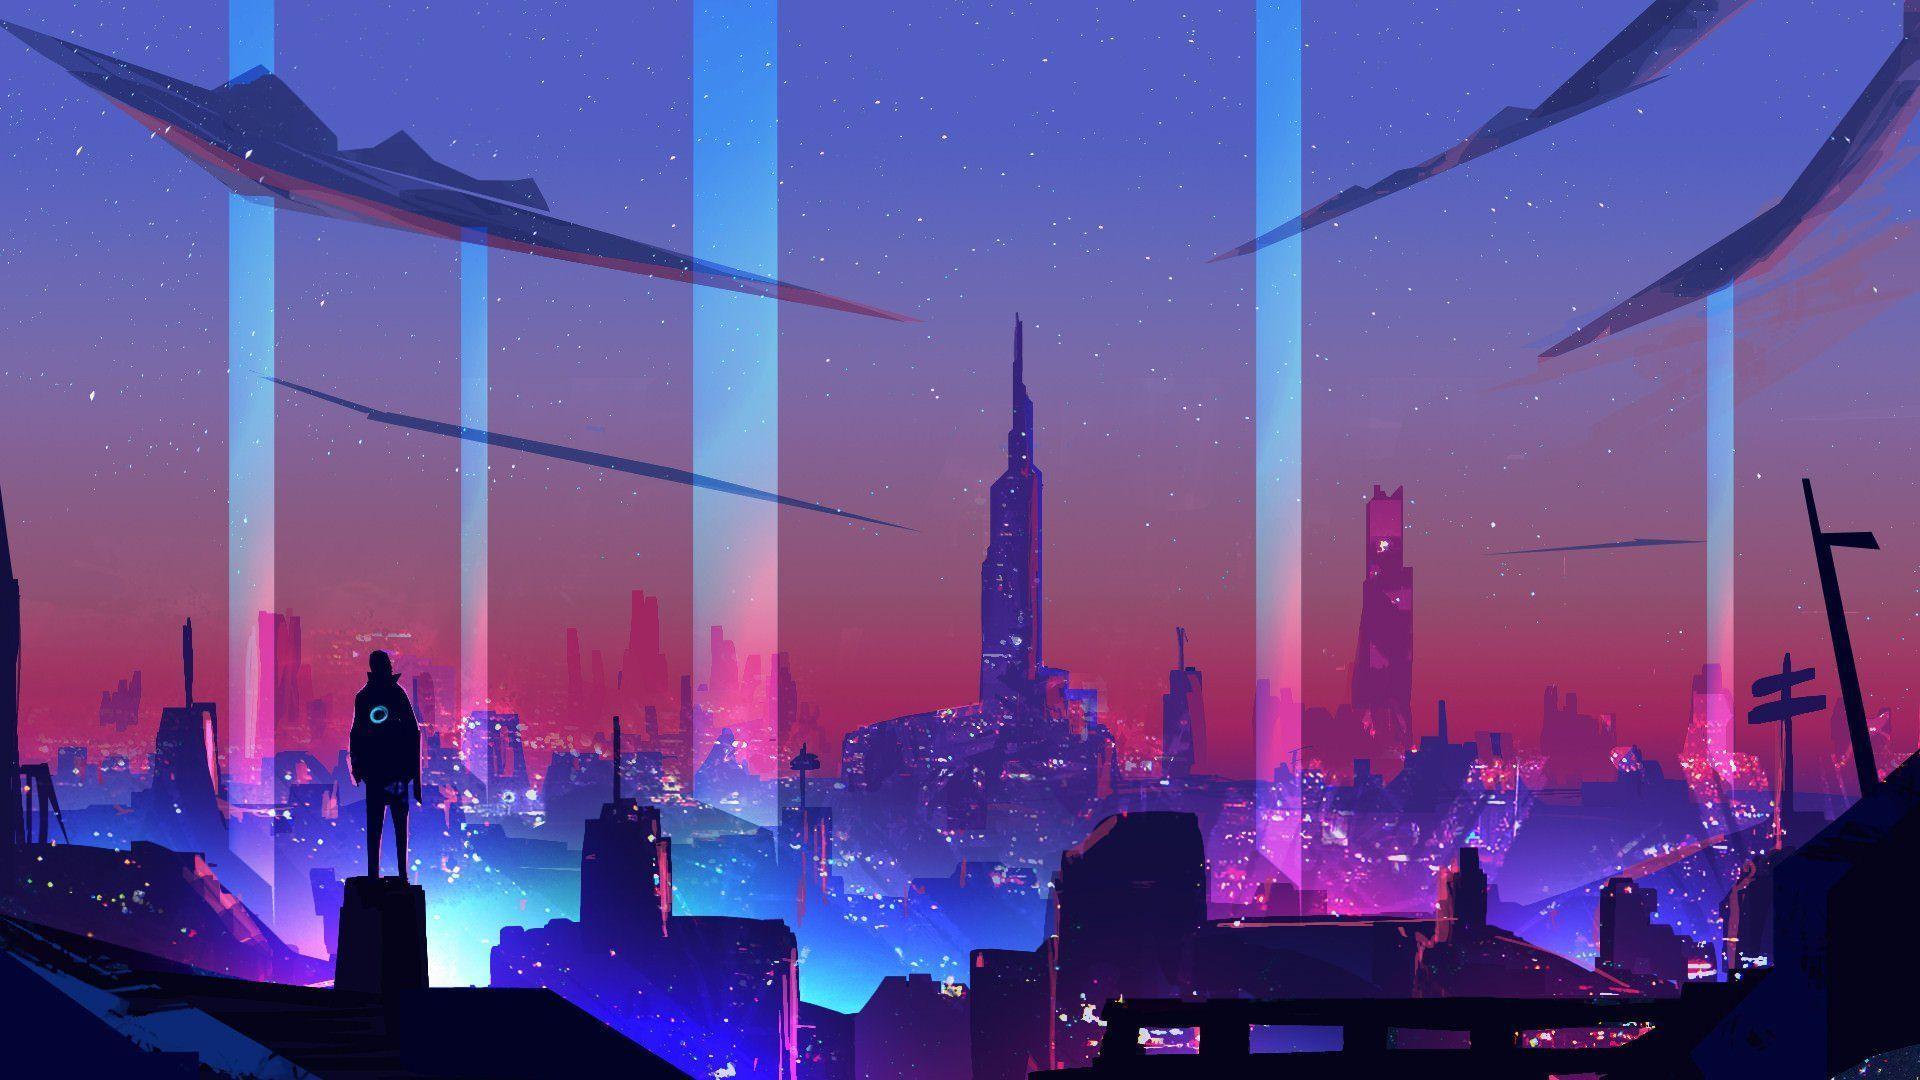 2D City Wallpapers - Top Free 2D City ...